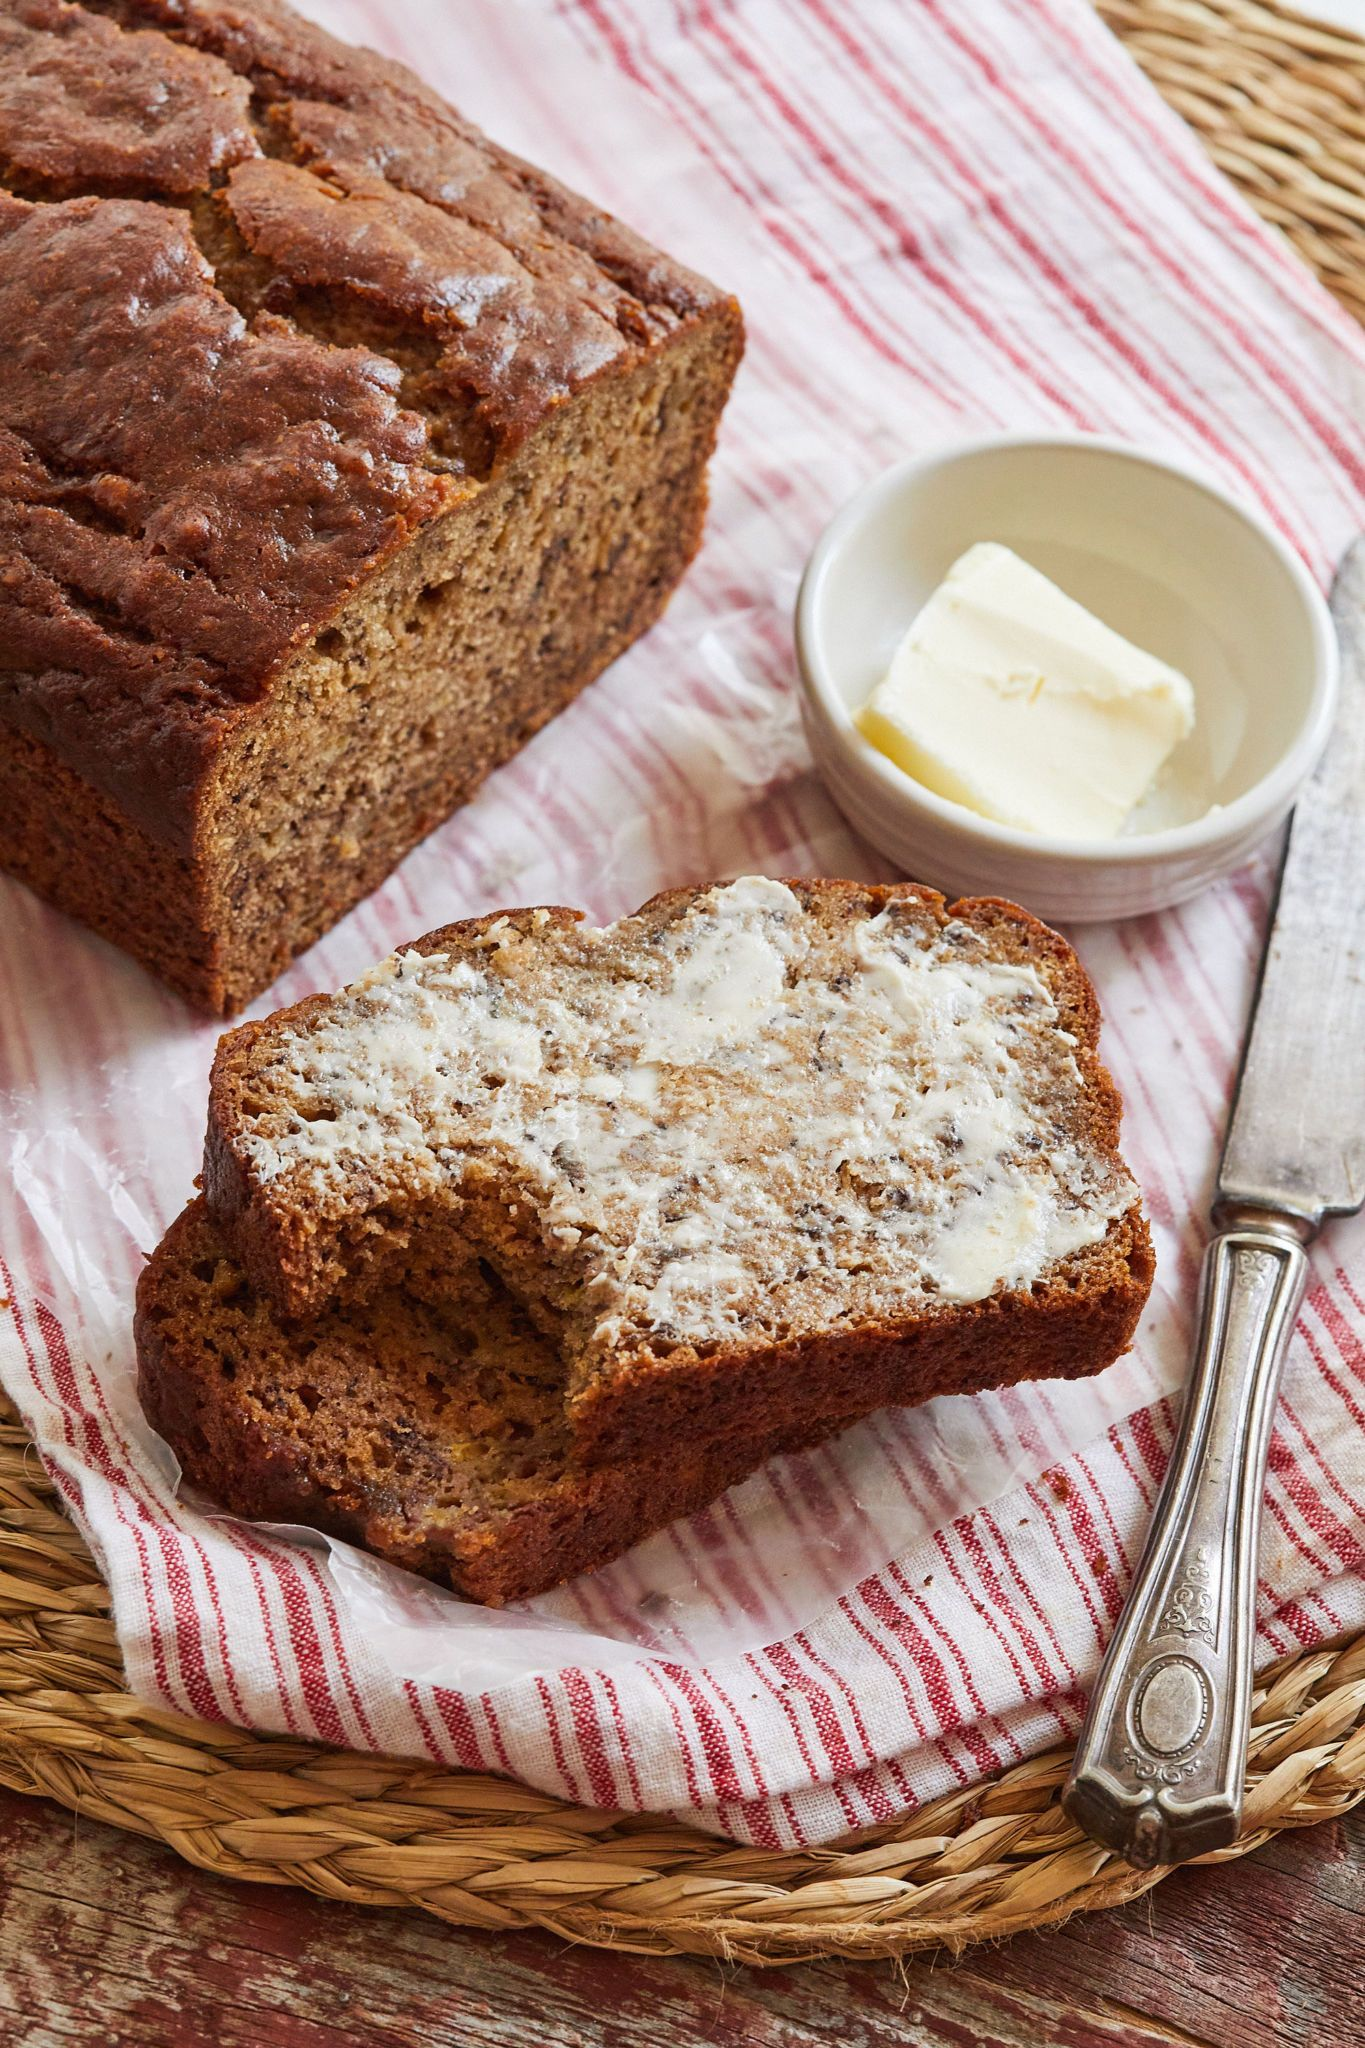 The Softest Sour Cream Banana Bread Gemma S Bigger Bolder Baking Recipe In 2020 Sour Cream Banana Bread Homemade Sour Cream Baking